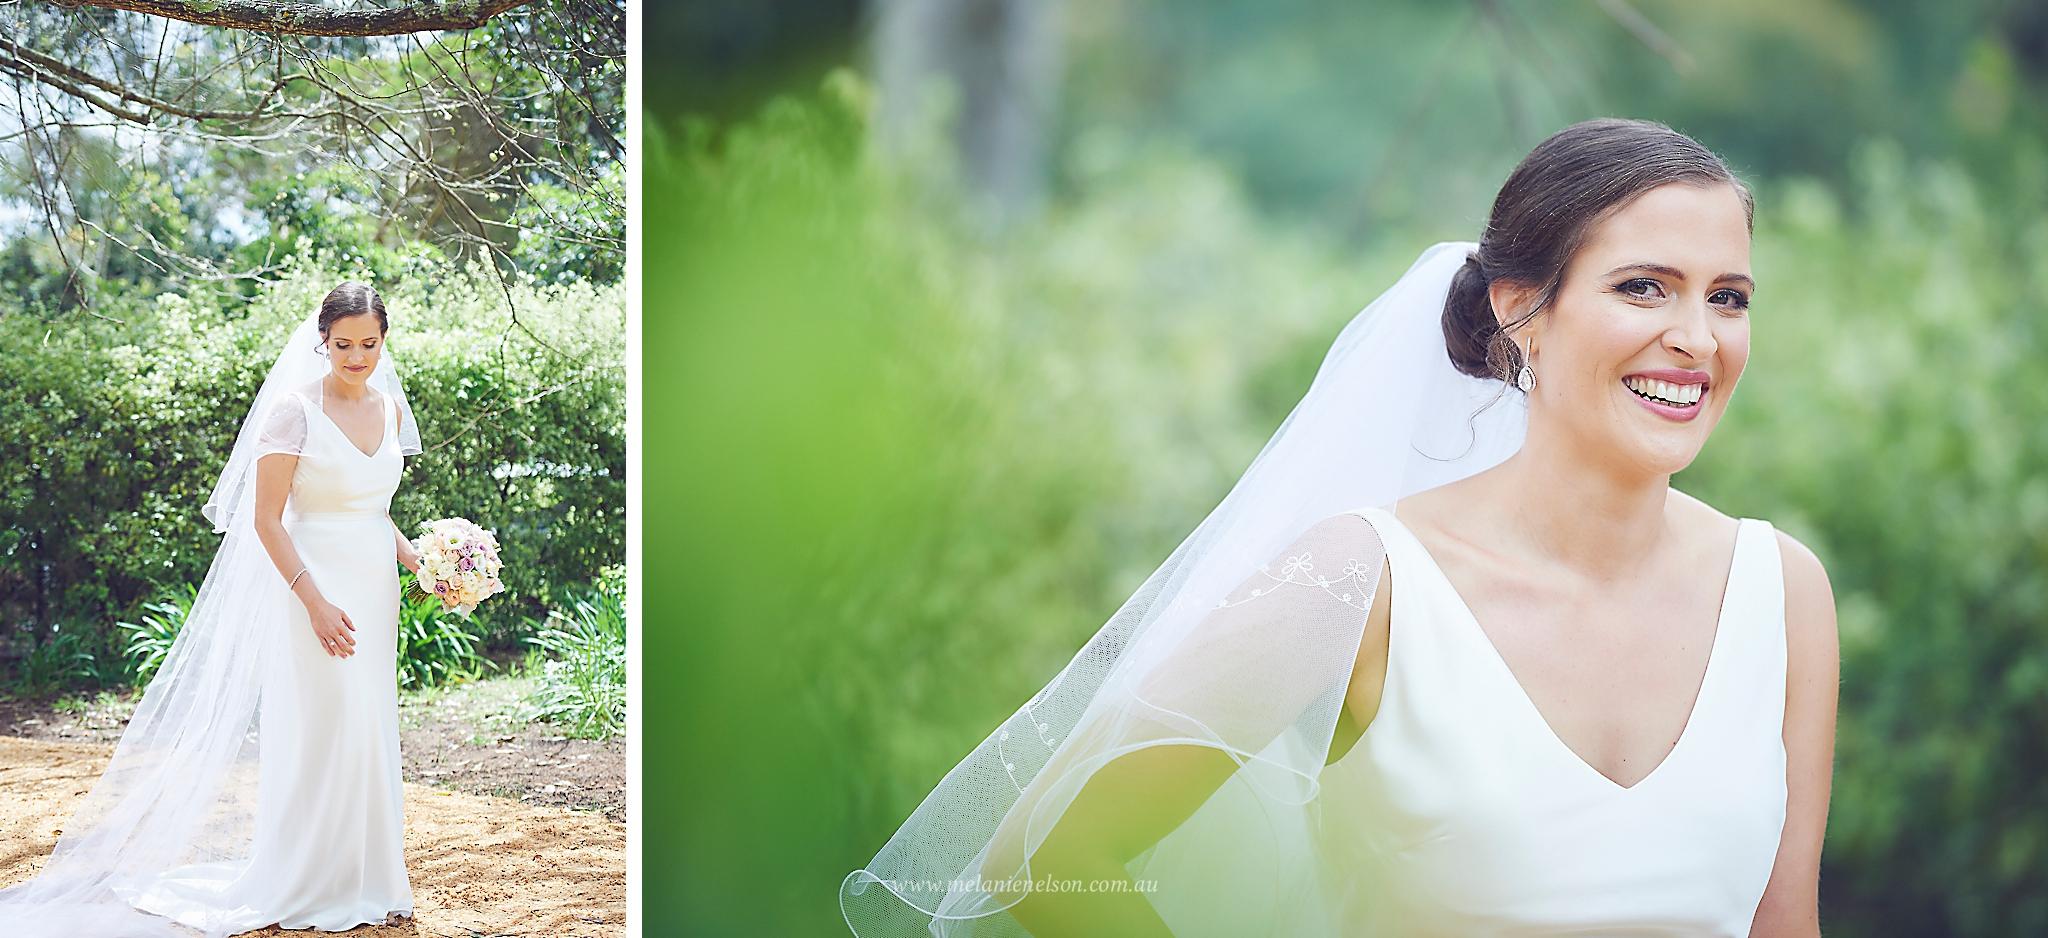 mount_lofty_wedding_0028.jpg